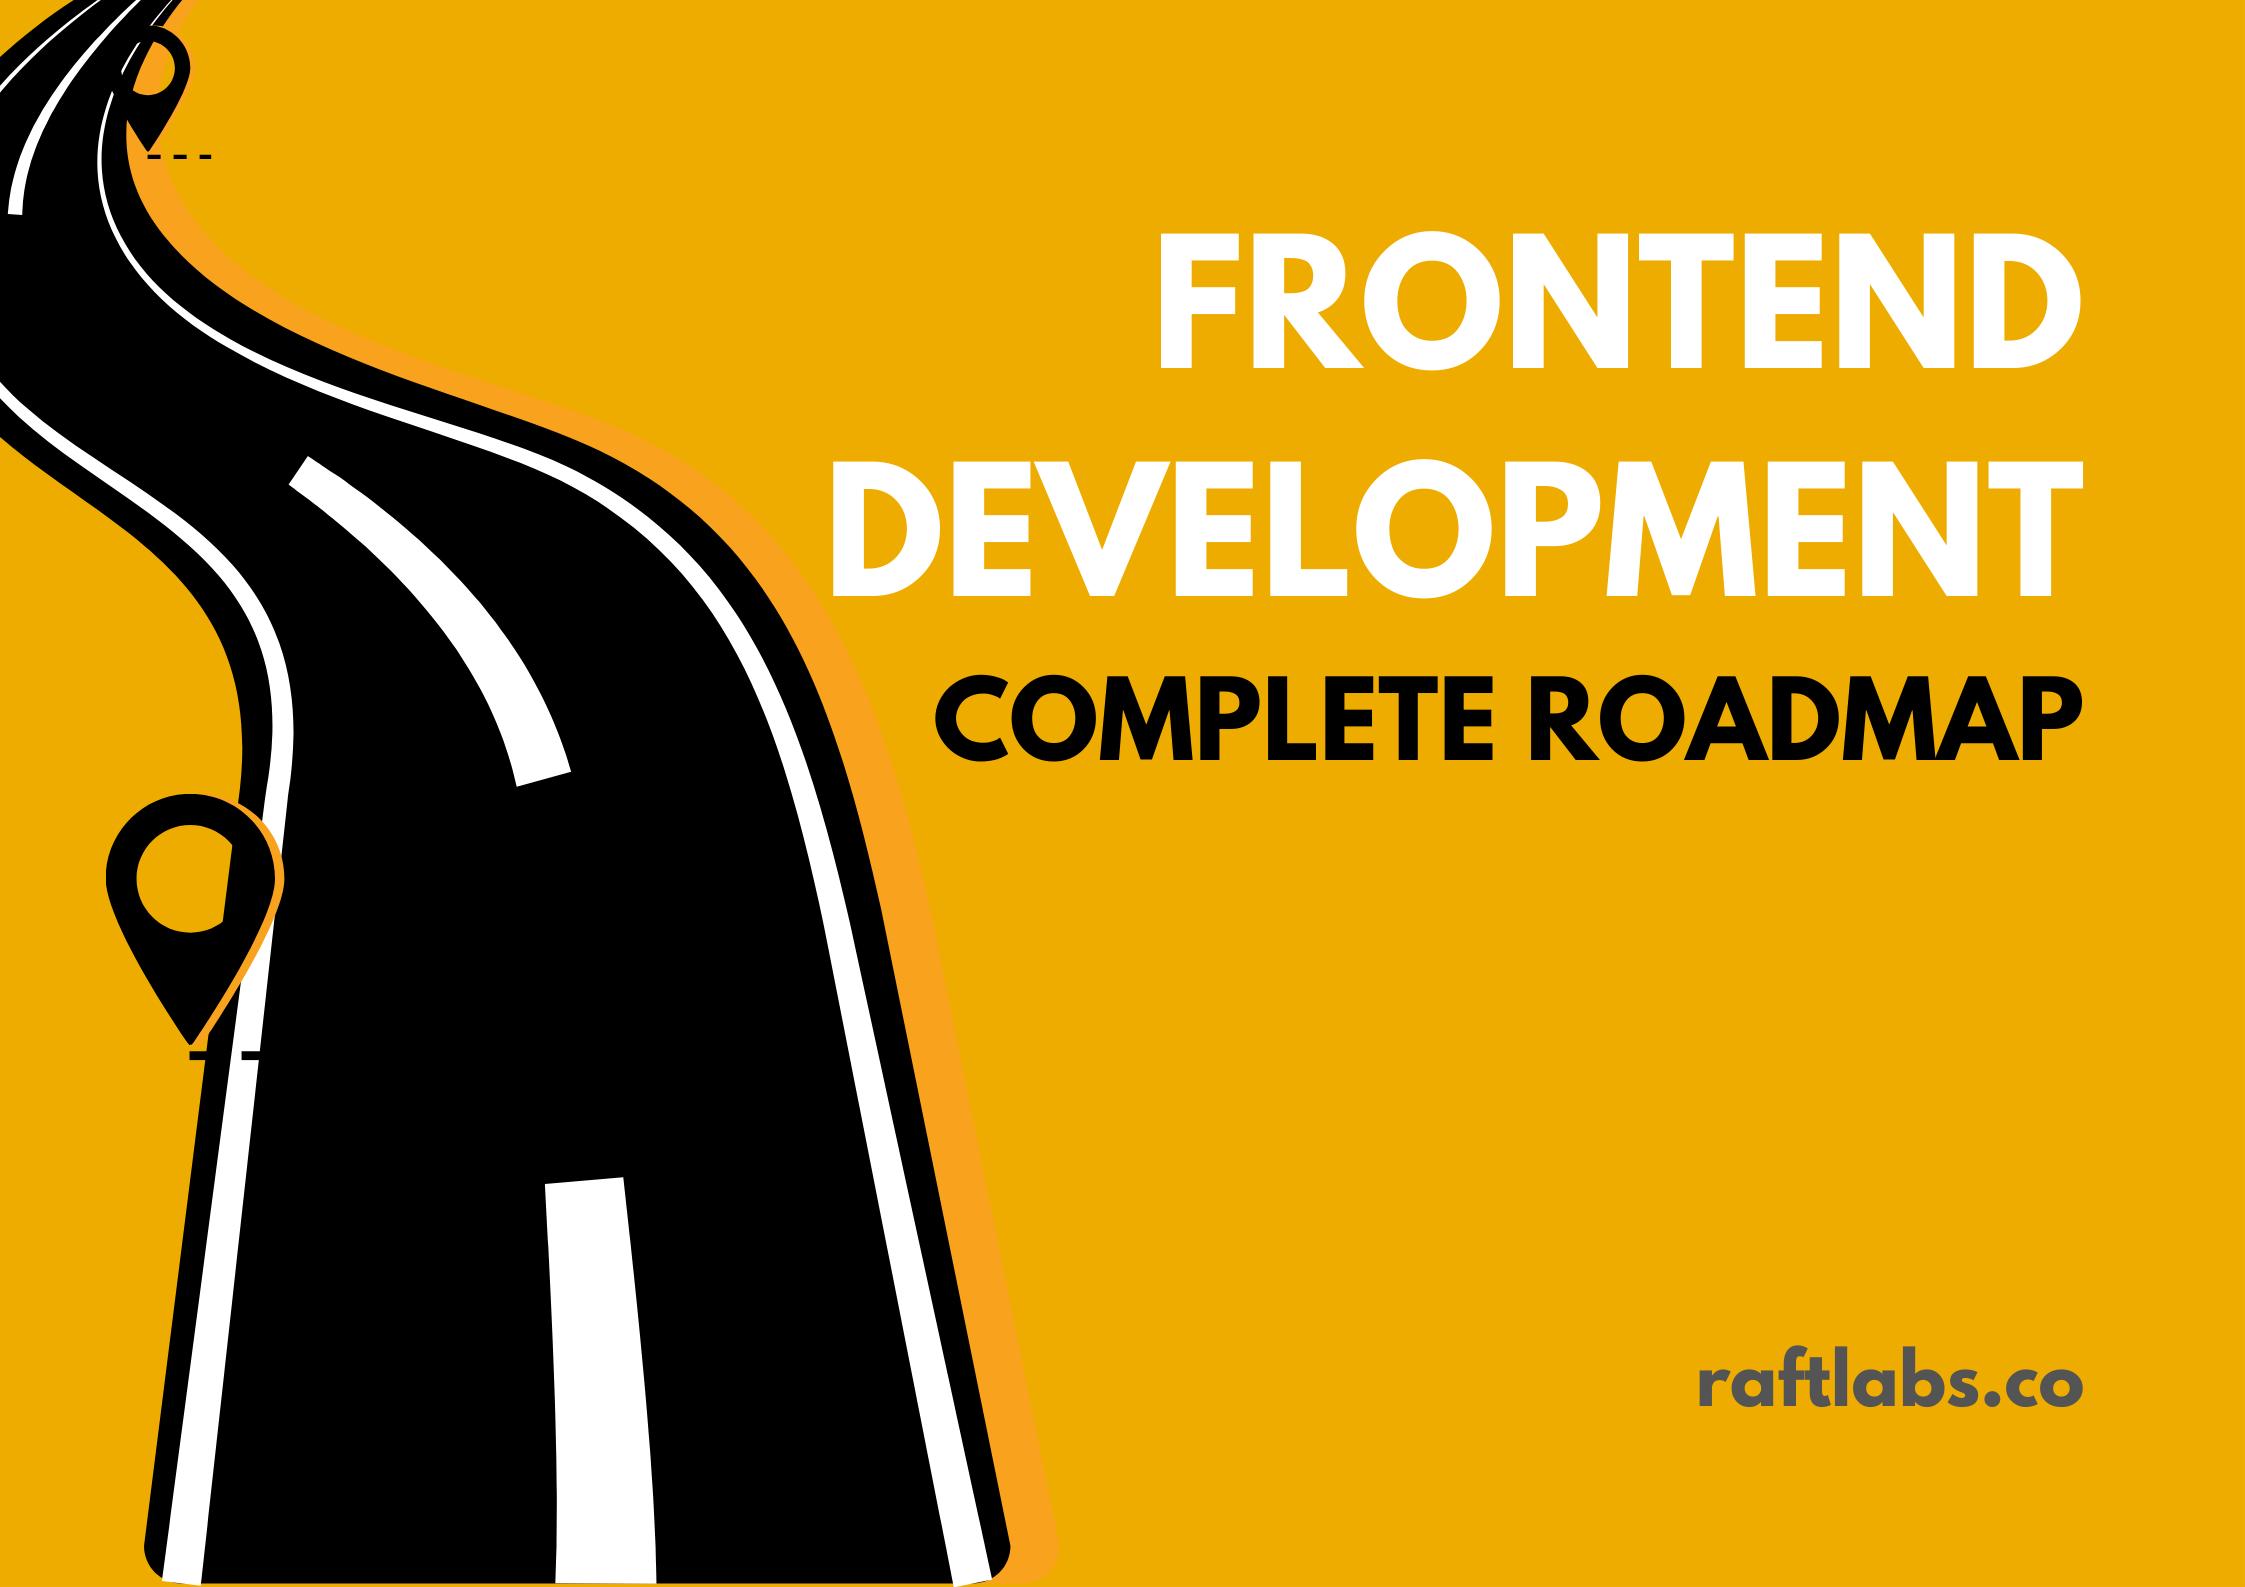 Thumbnail of Complete Roadmap of Frontend Developer